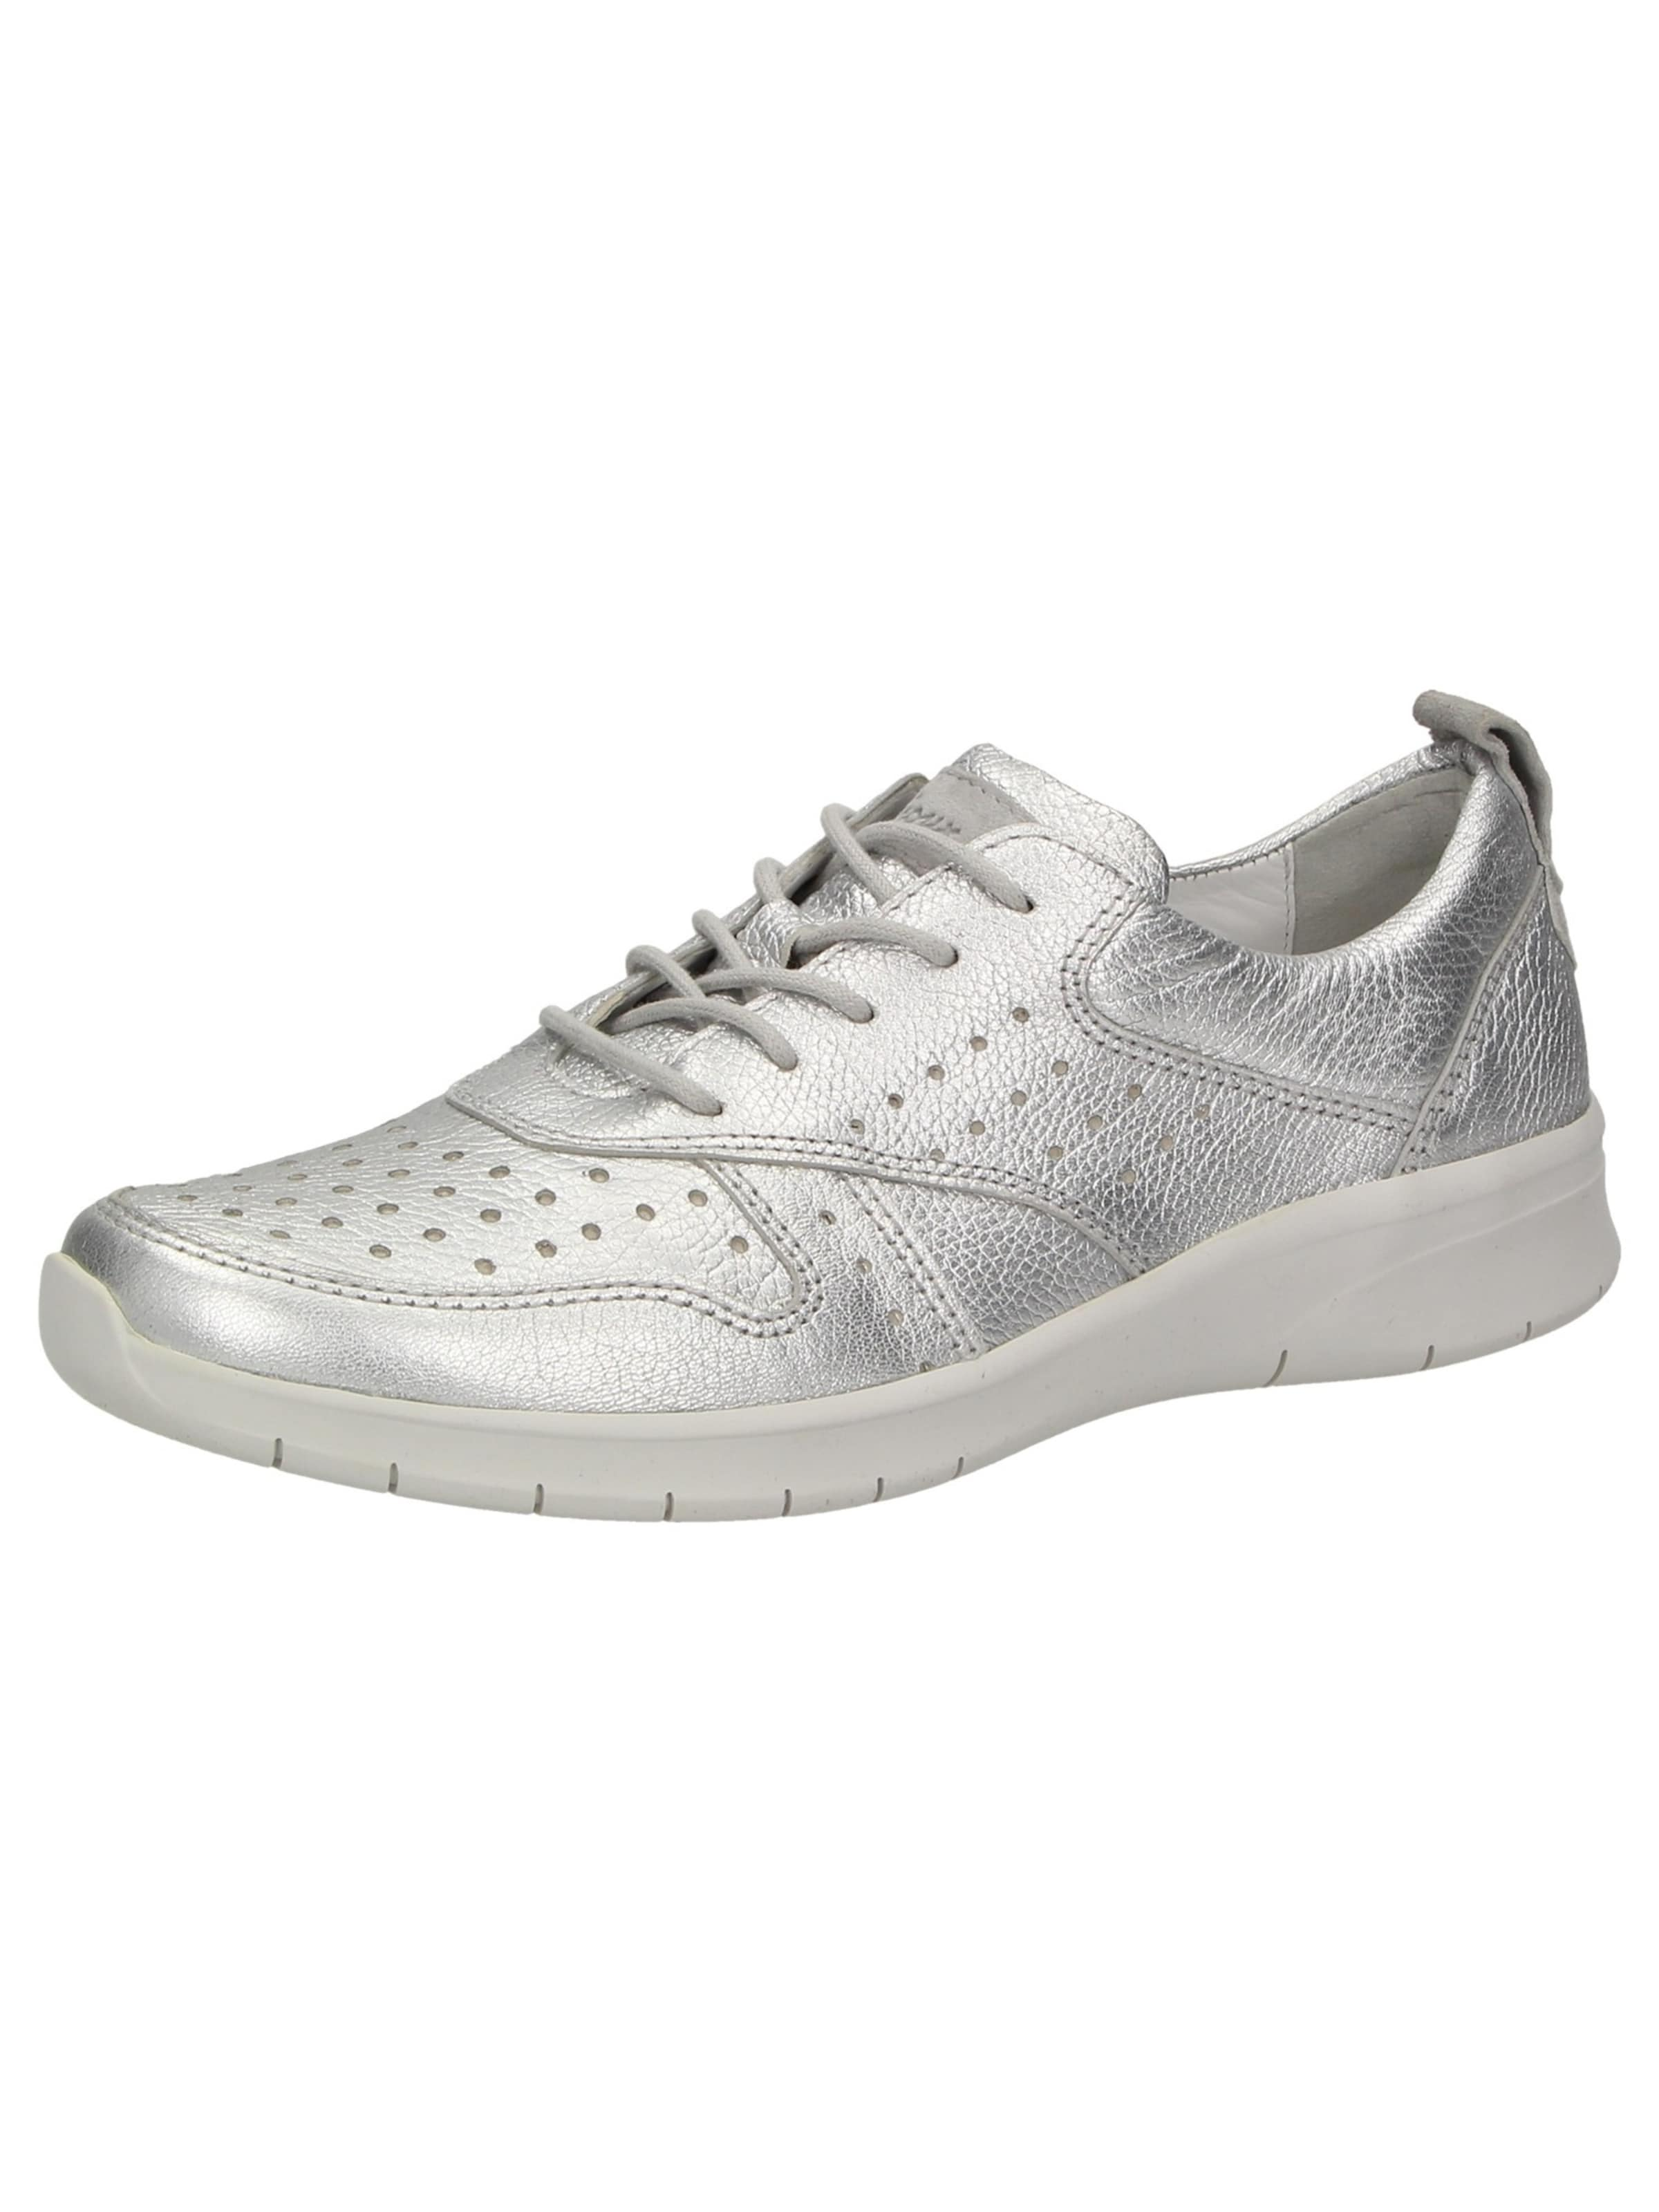 SIOUX Sneaker Liduma-700-XL Verschleißfeste billige Schuhe